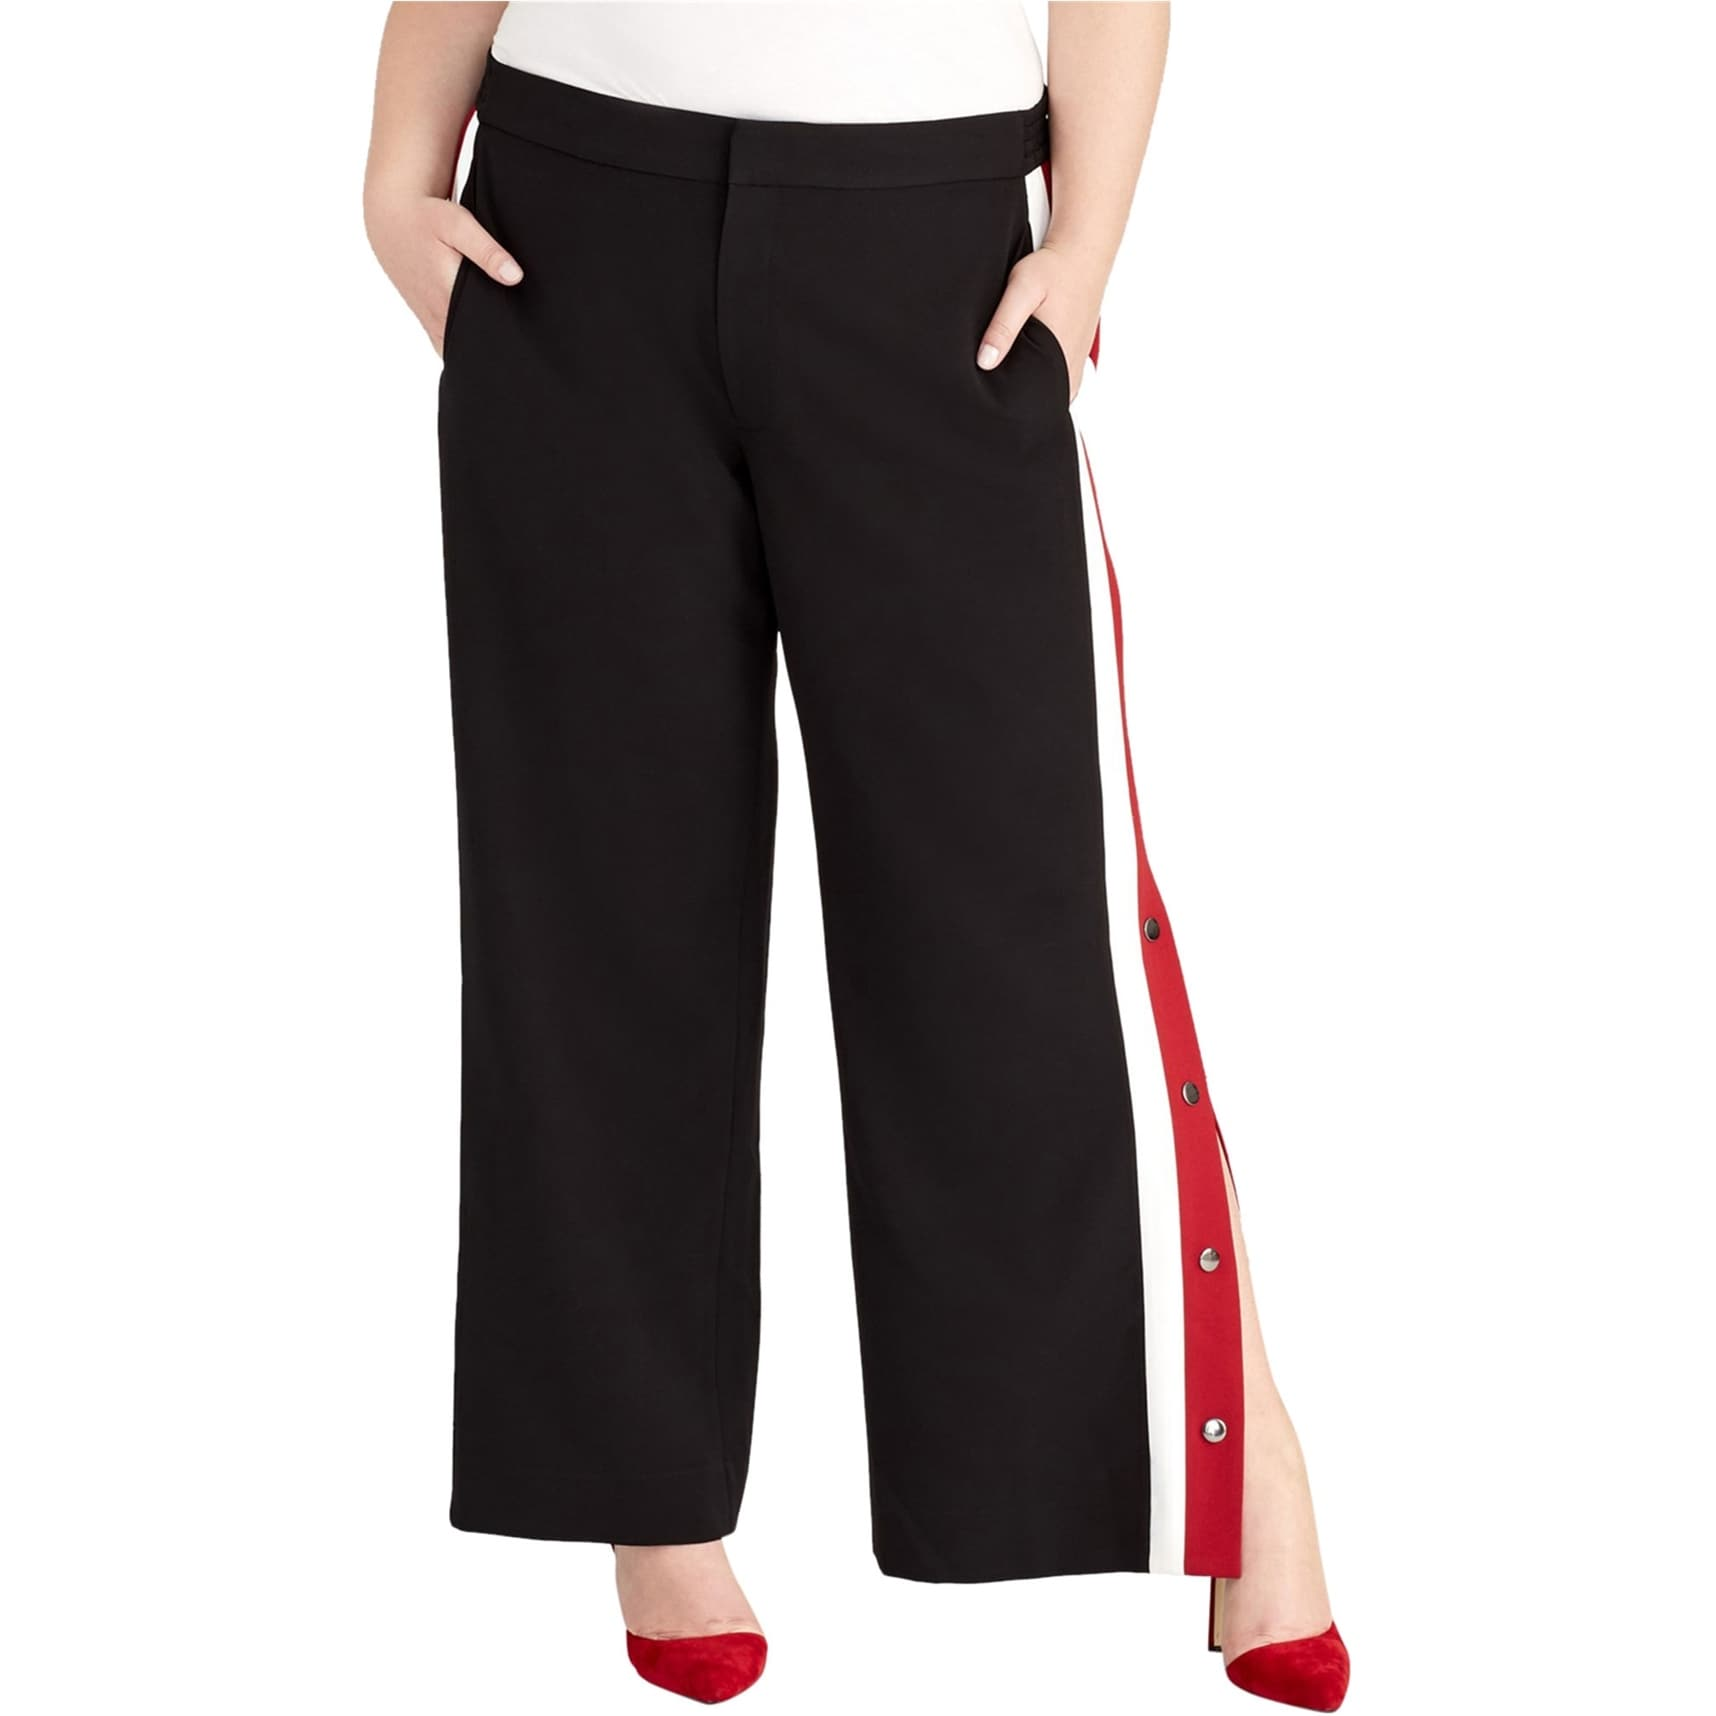 20W Rachel Roy Womens Addison Casual Wide Leg Pants Black